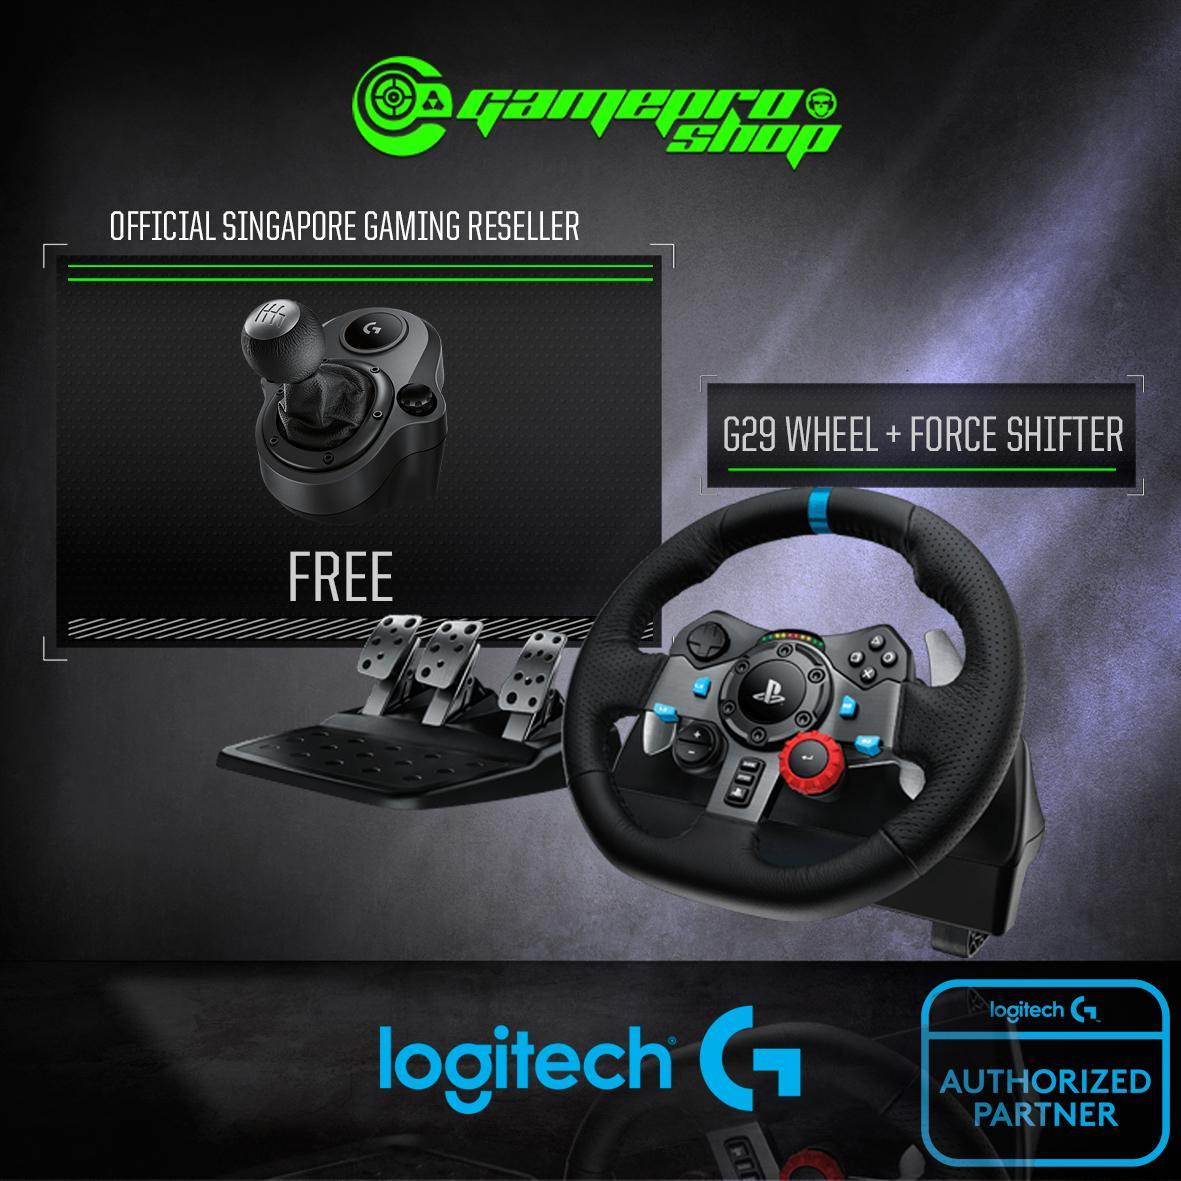 Latest Logitech Gaming Products | Enjoy Huge Discounts | Lazada SG